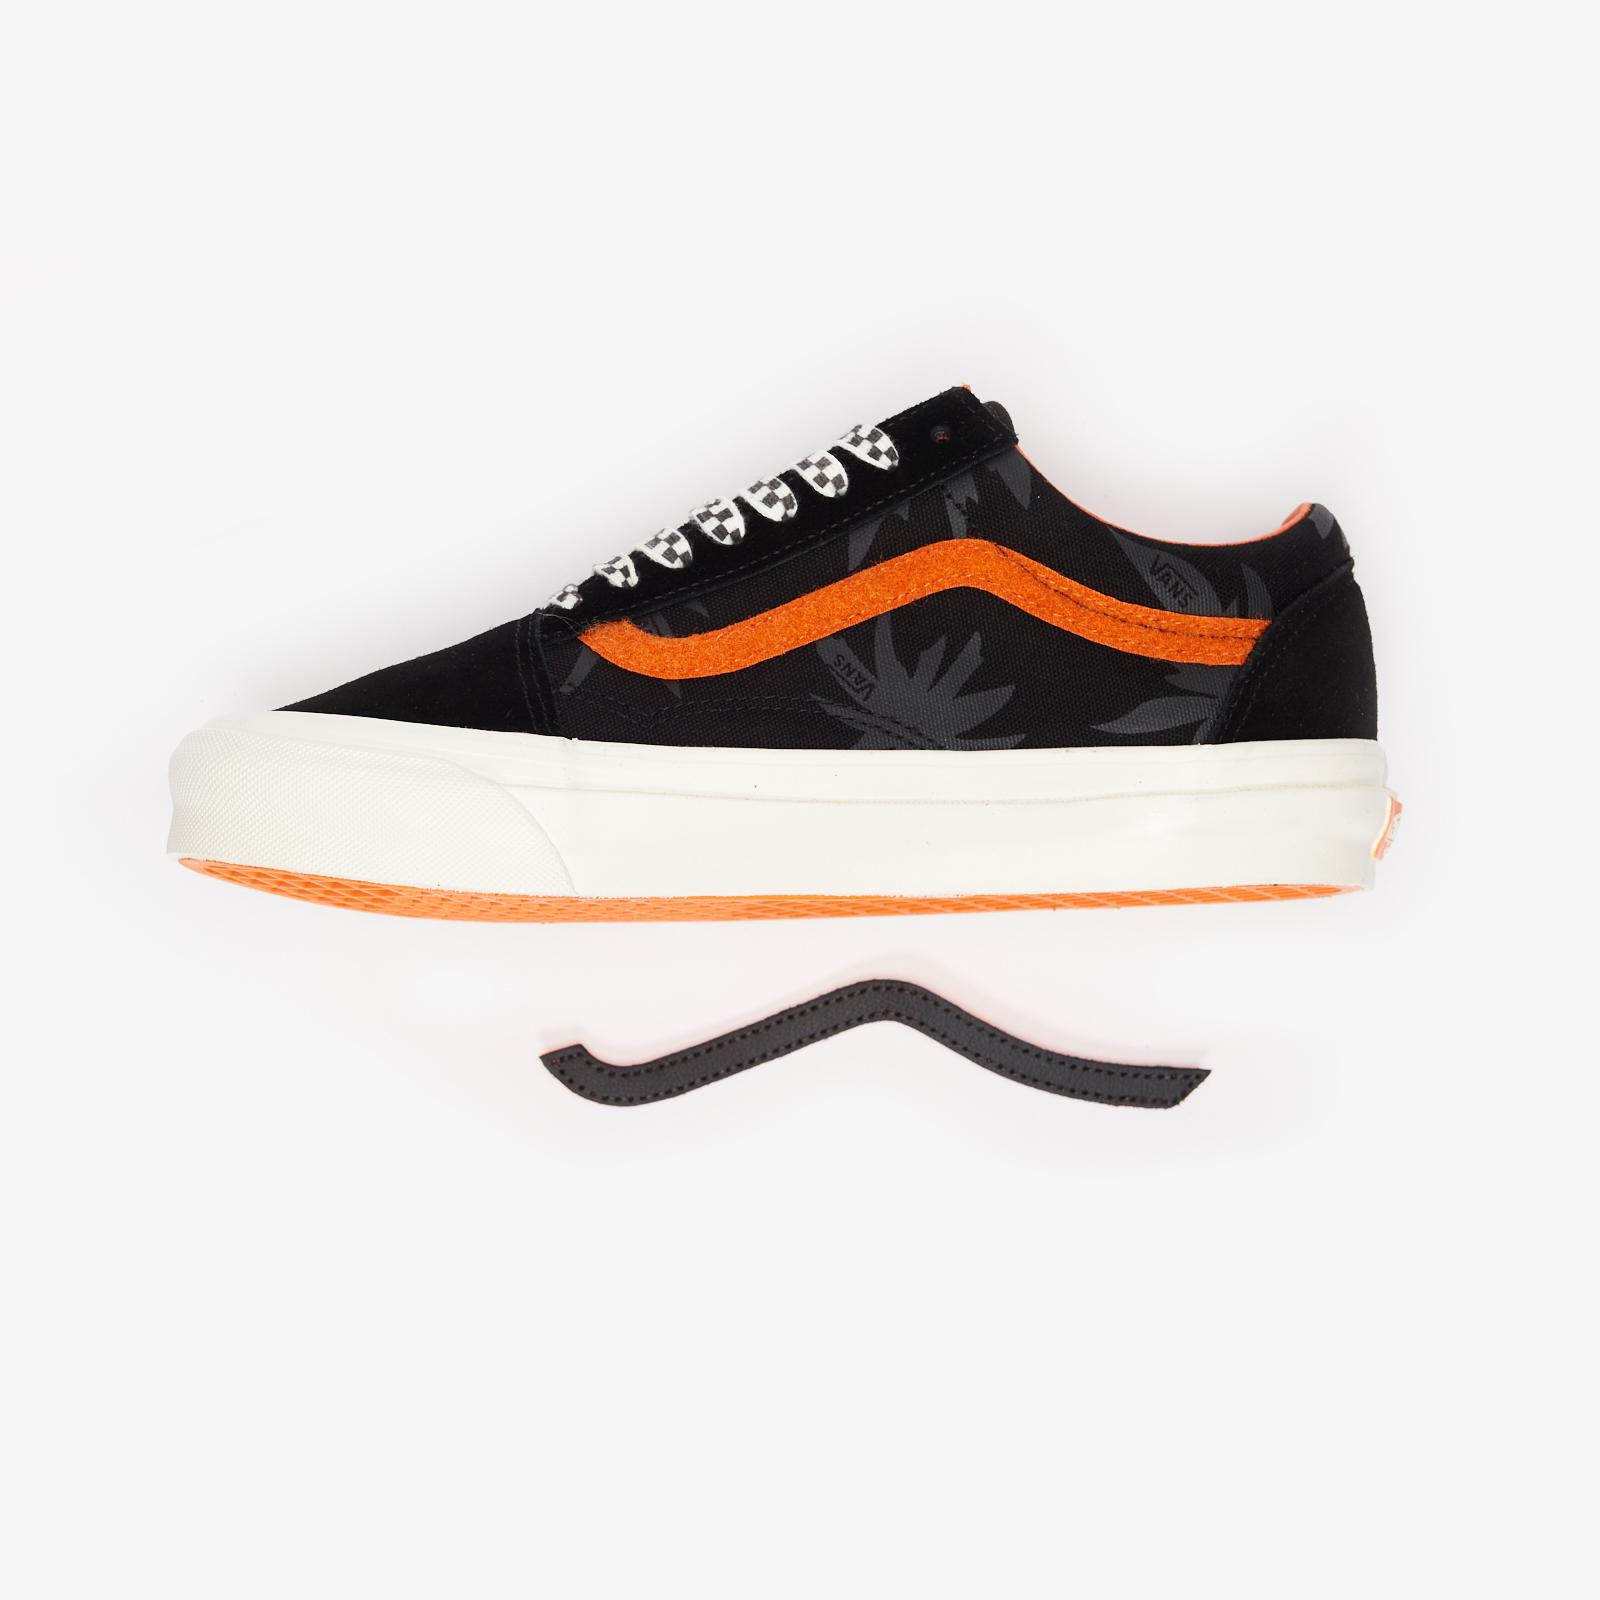 Vans UA OG Old Skool LX x Porter - Vn0a4p3xxg5 - SNS | sneakers ...